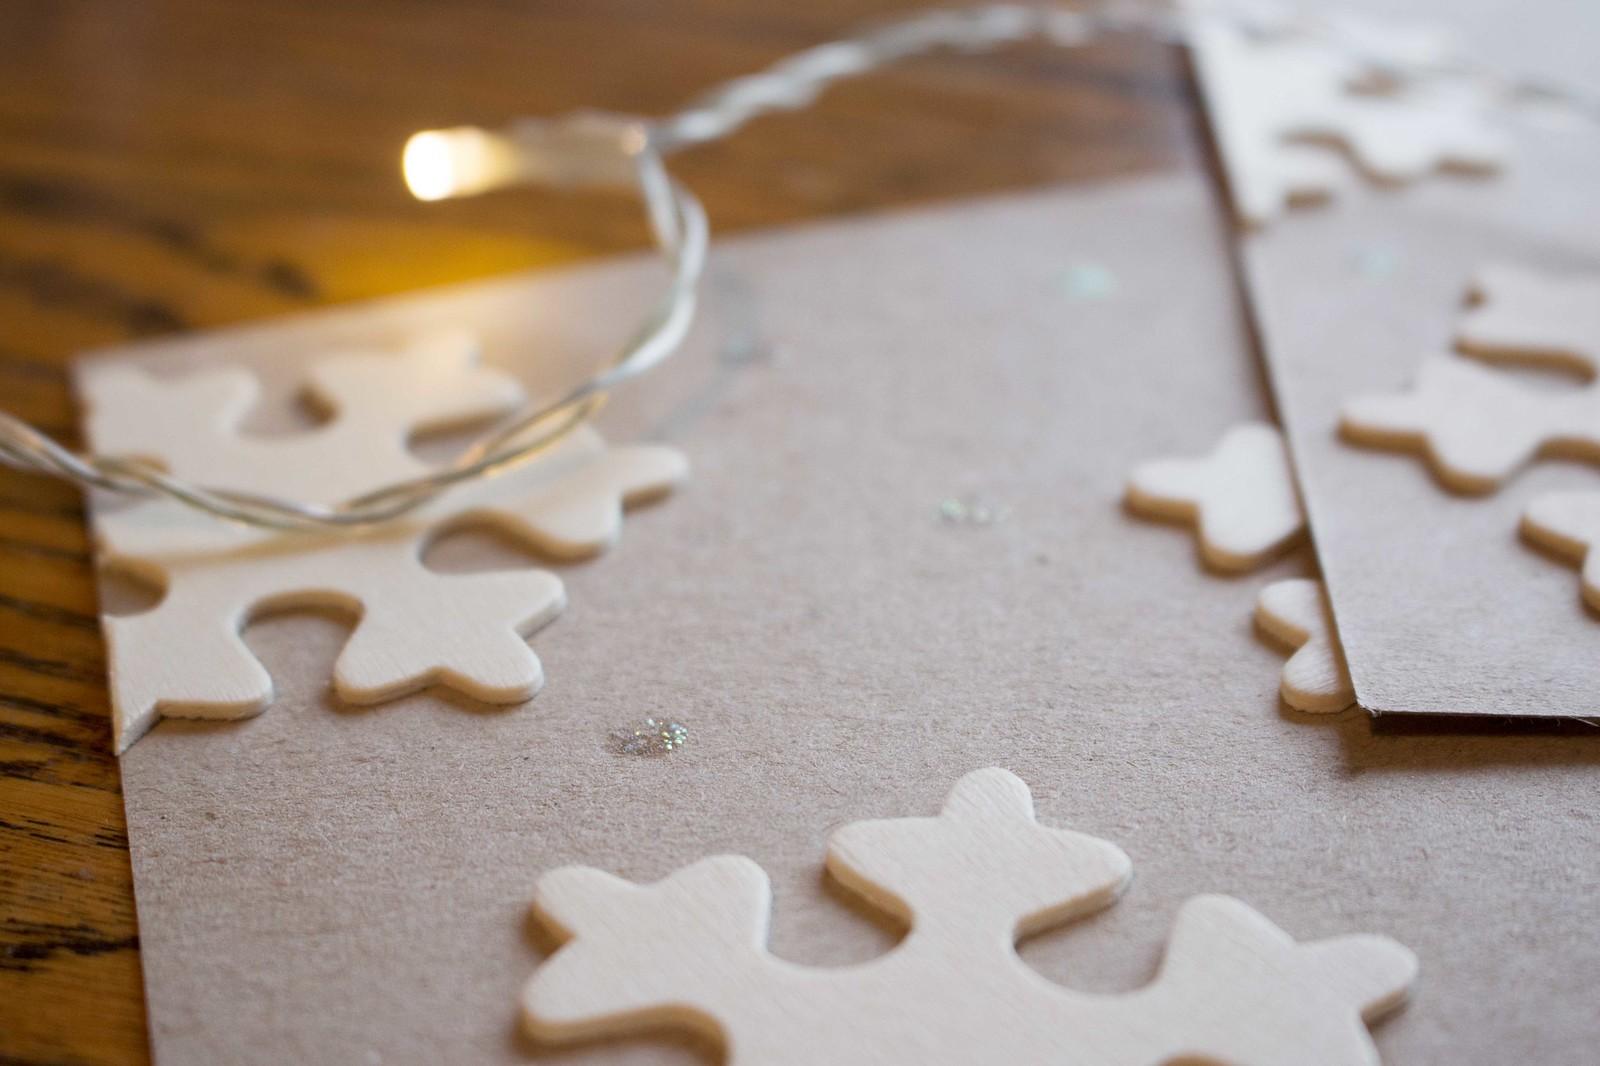 minimalistiset itse tehdyt joulukortit 3